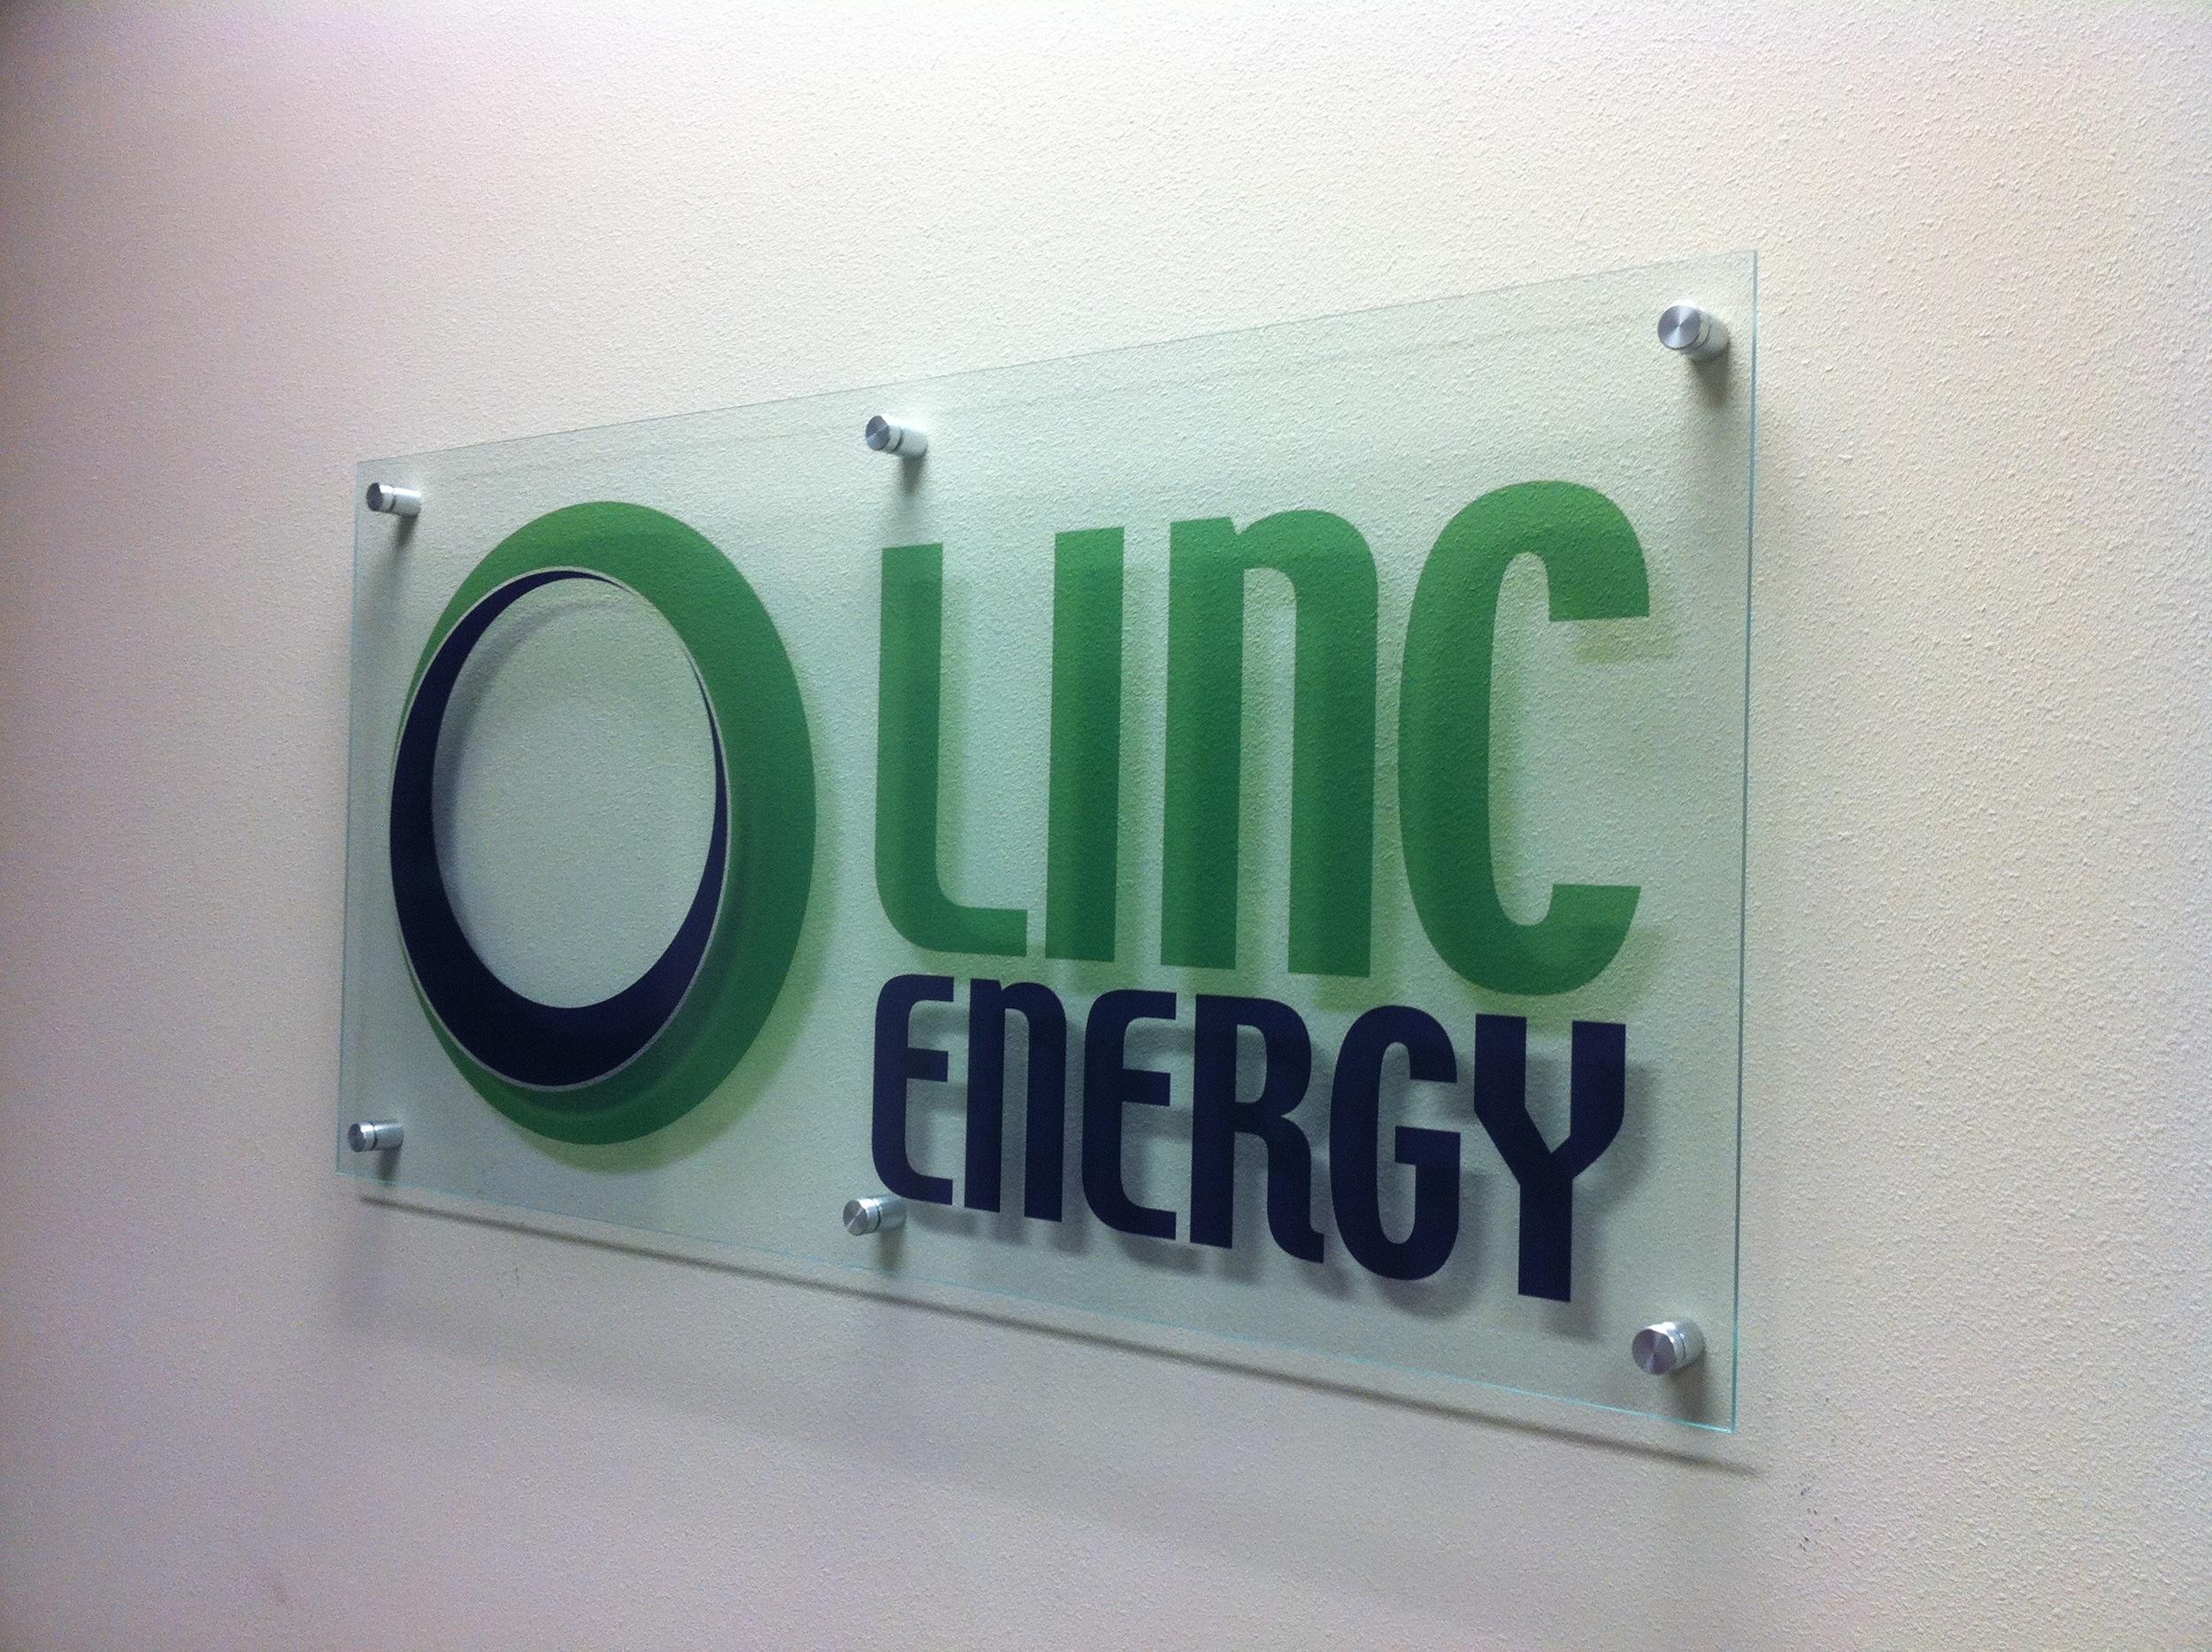 Logo printed on acrylic sign.